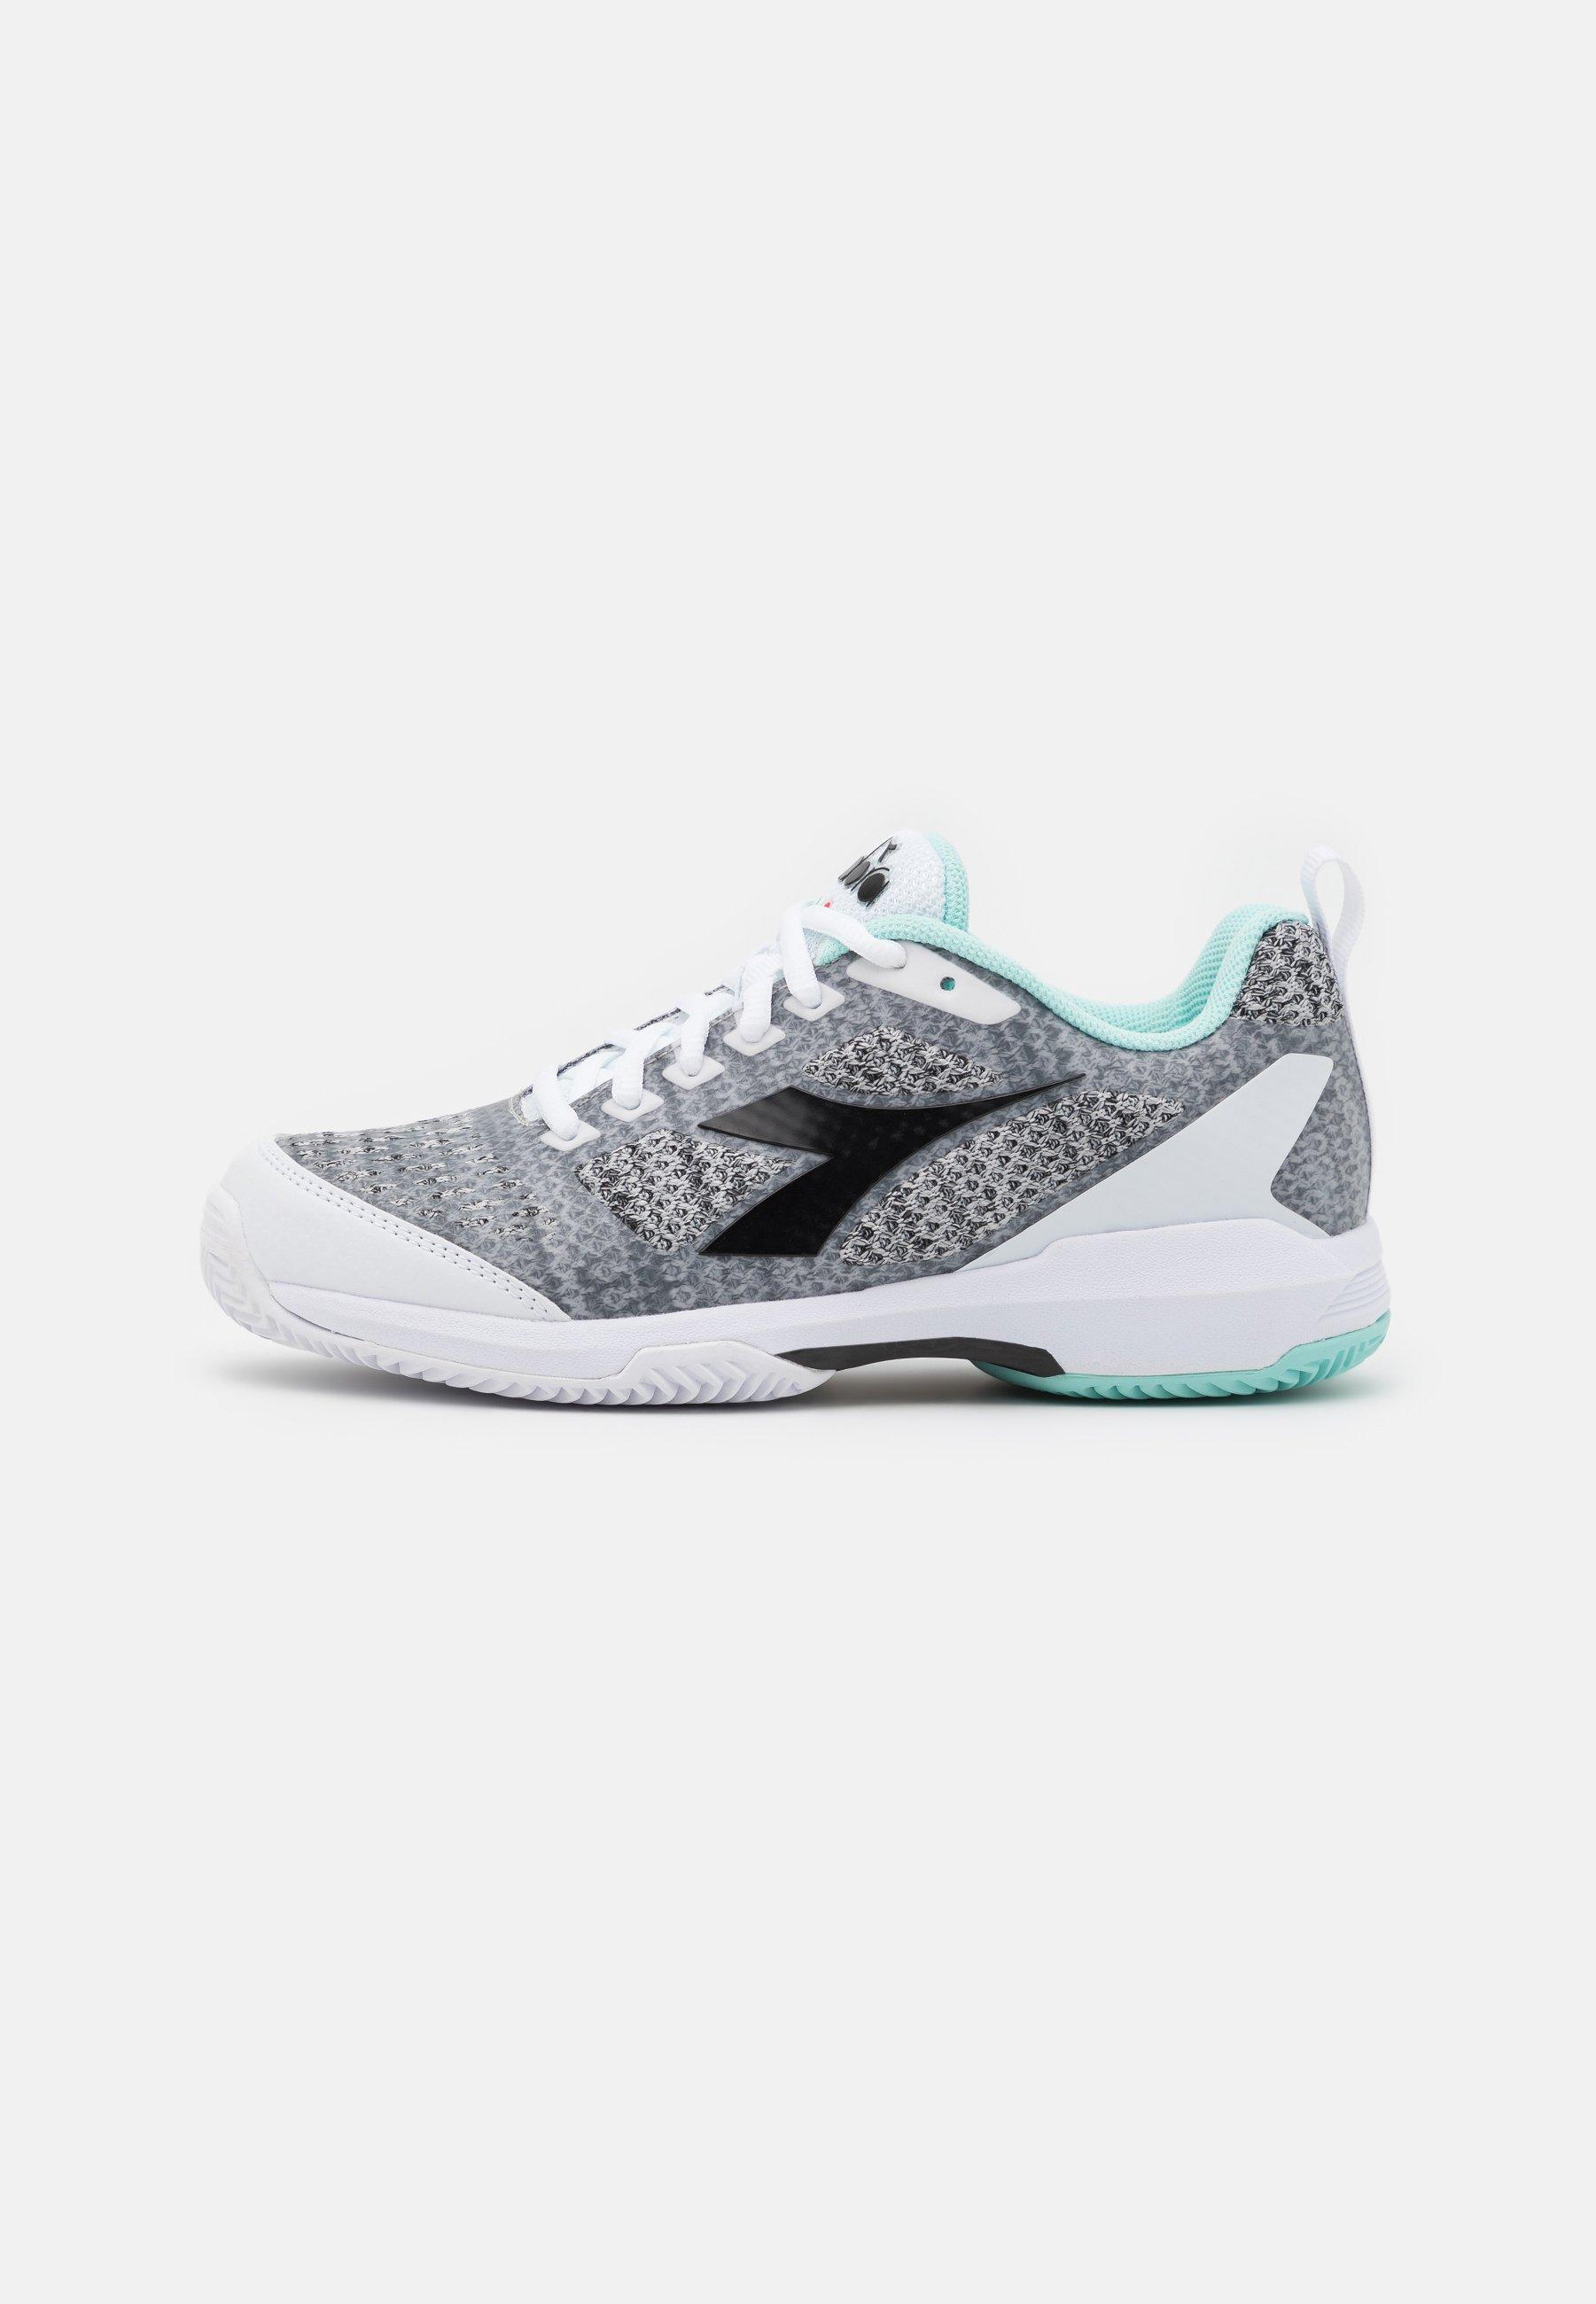 Femme S.SHOT 2 CLAY - Chaussures de tennis pour terre-battueerre battue